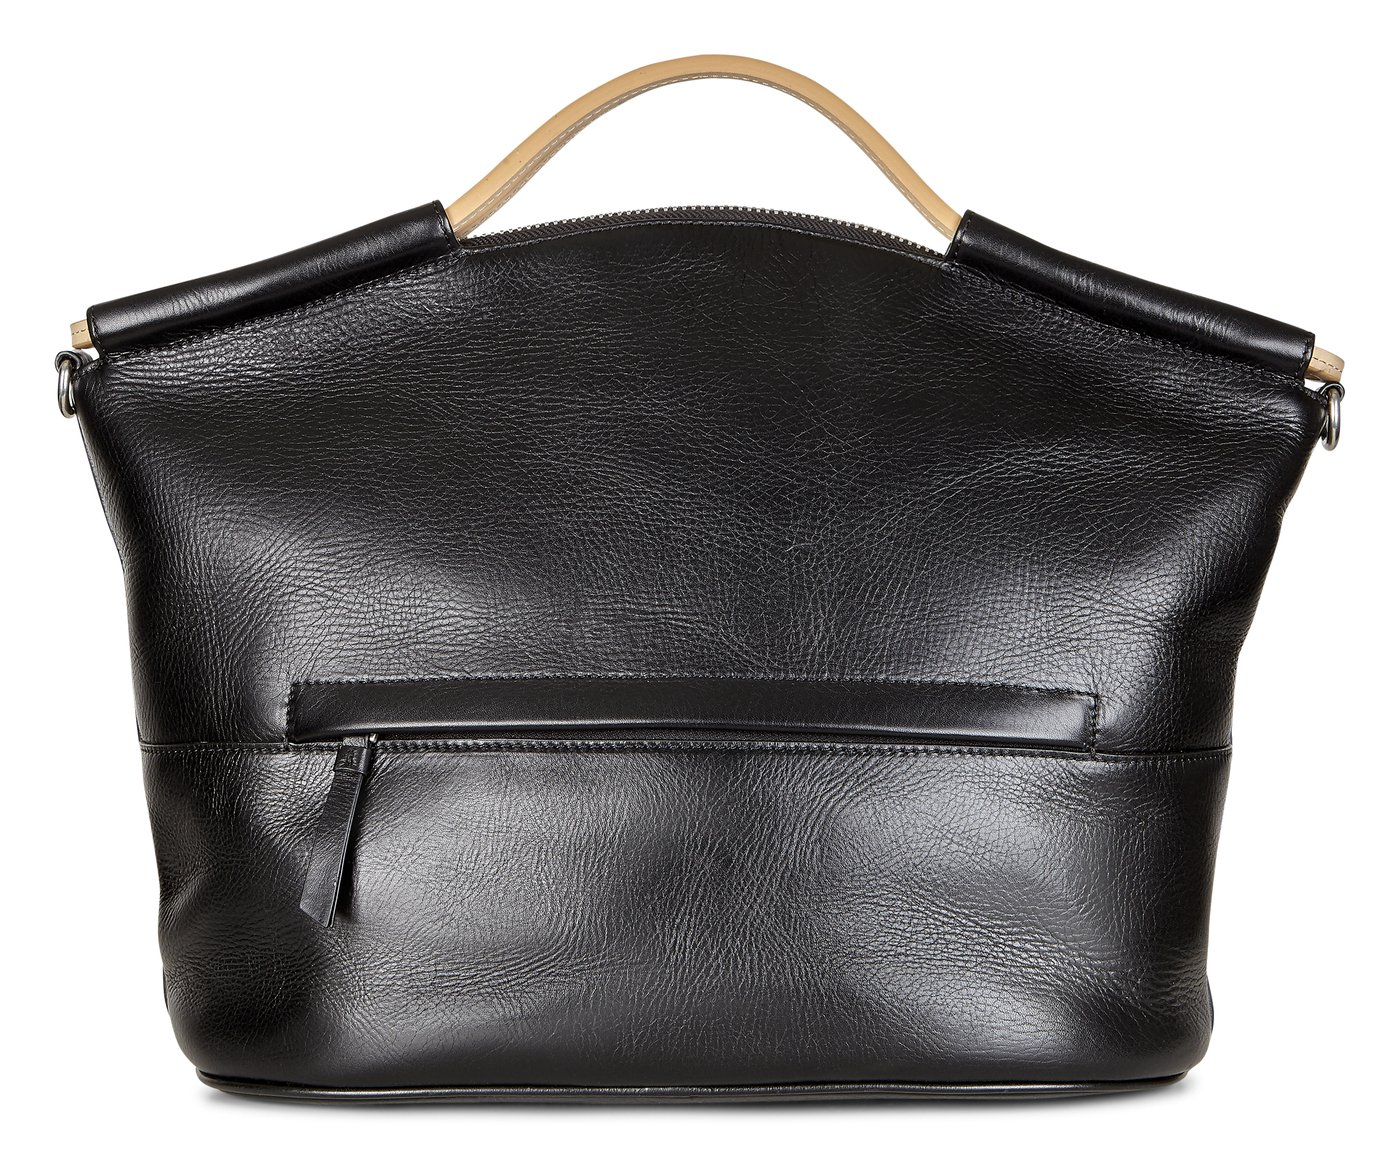 ECCO SP2 Vesper Large Doctors Bag